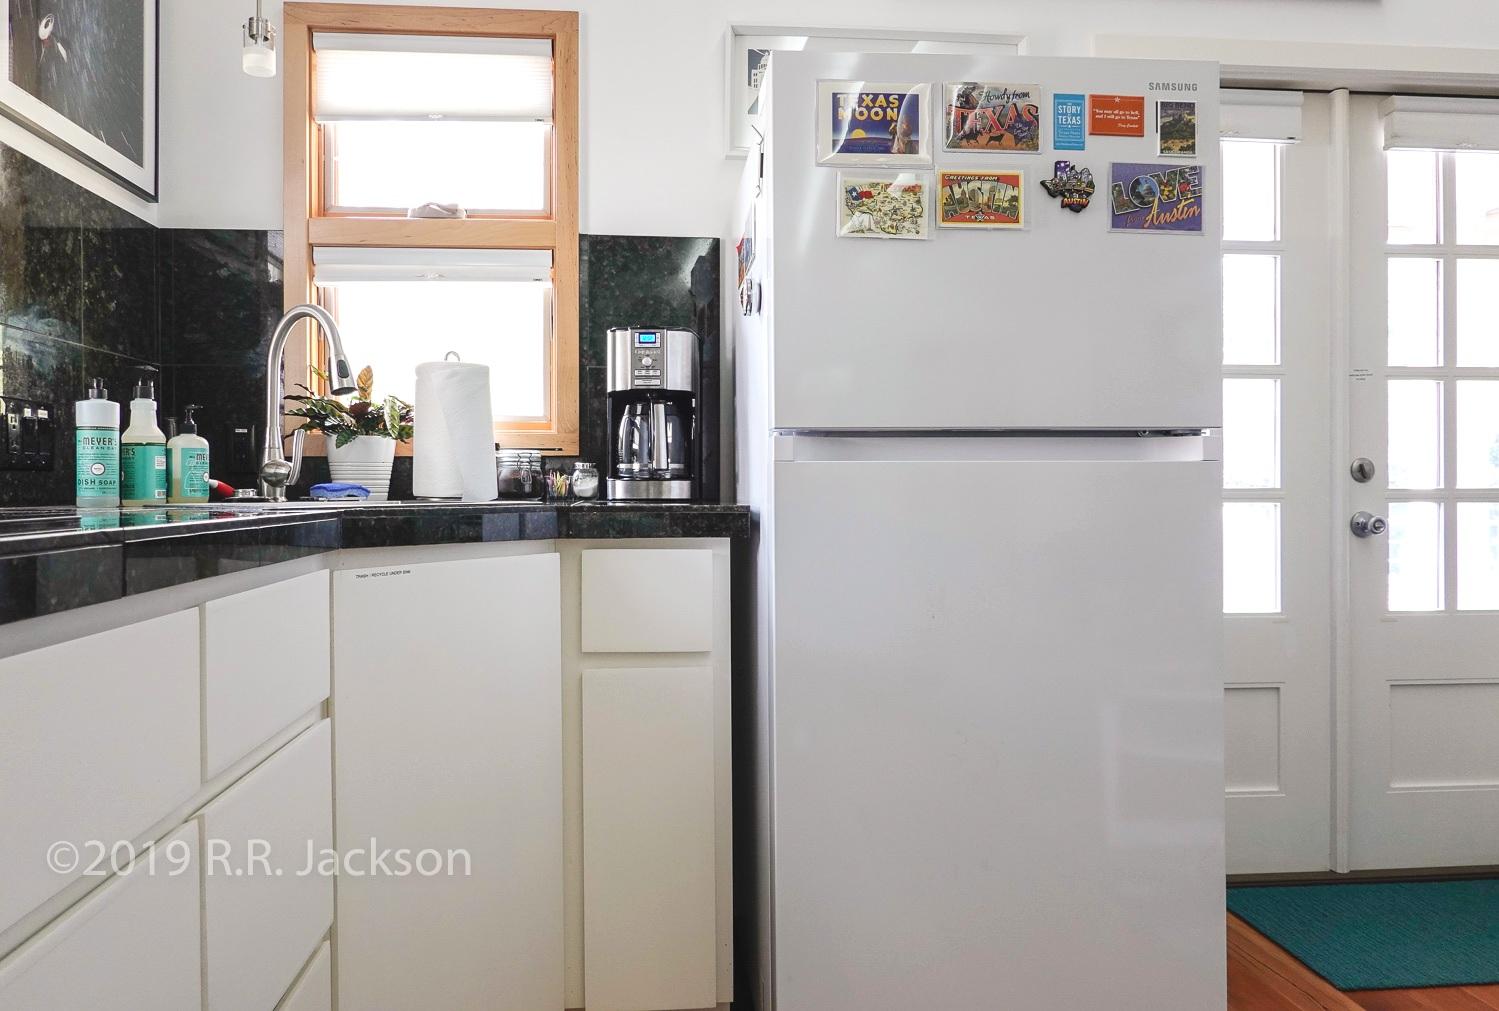 Refrigerator - new August 2019